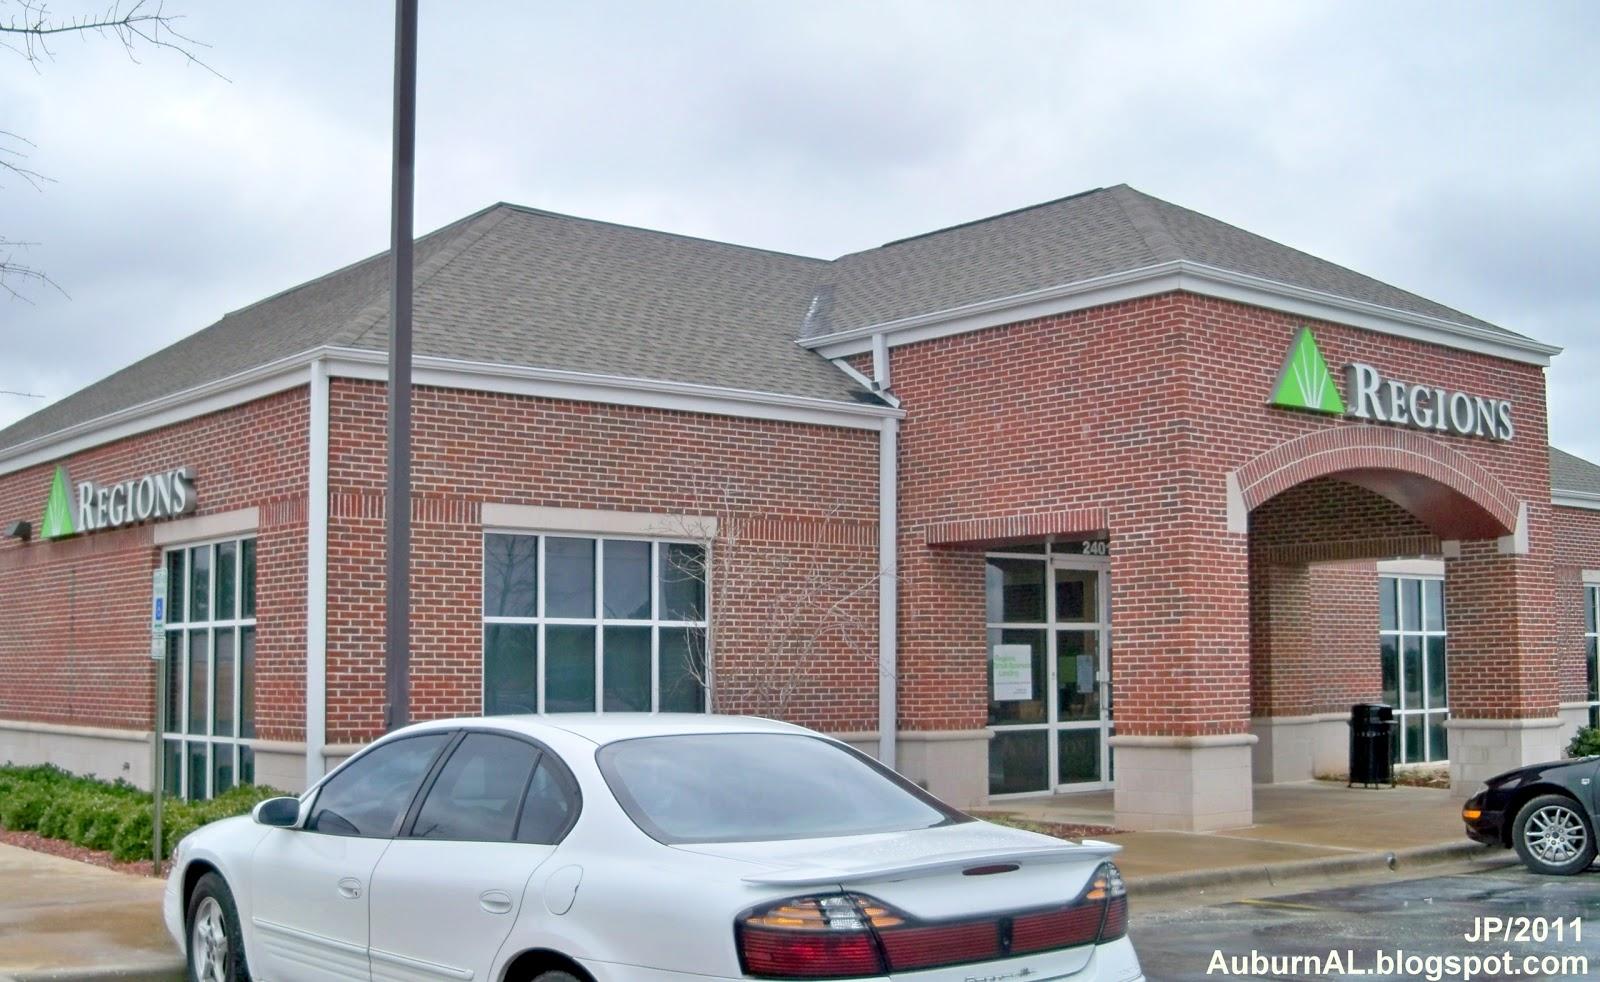 Lee County Alabama Building Department